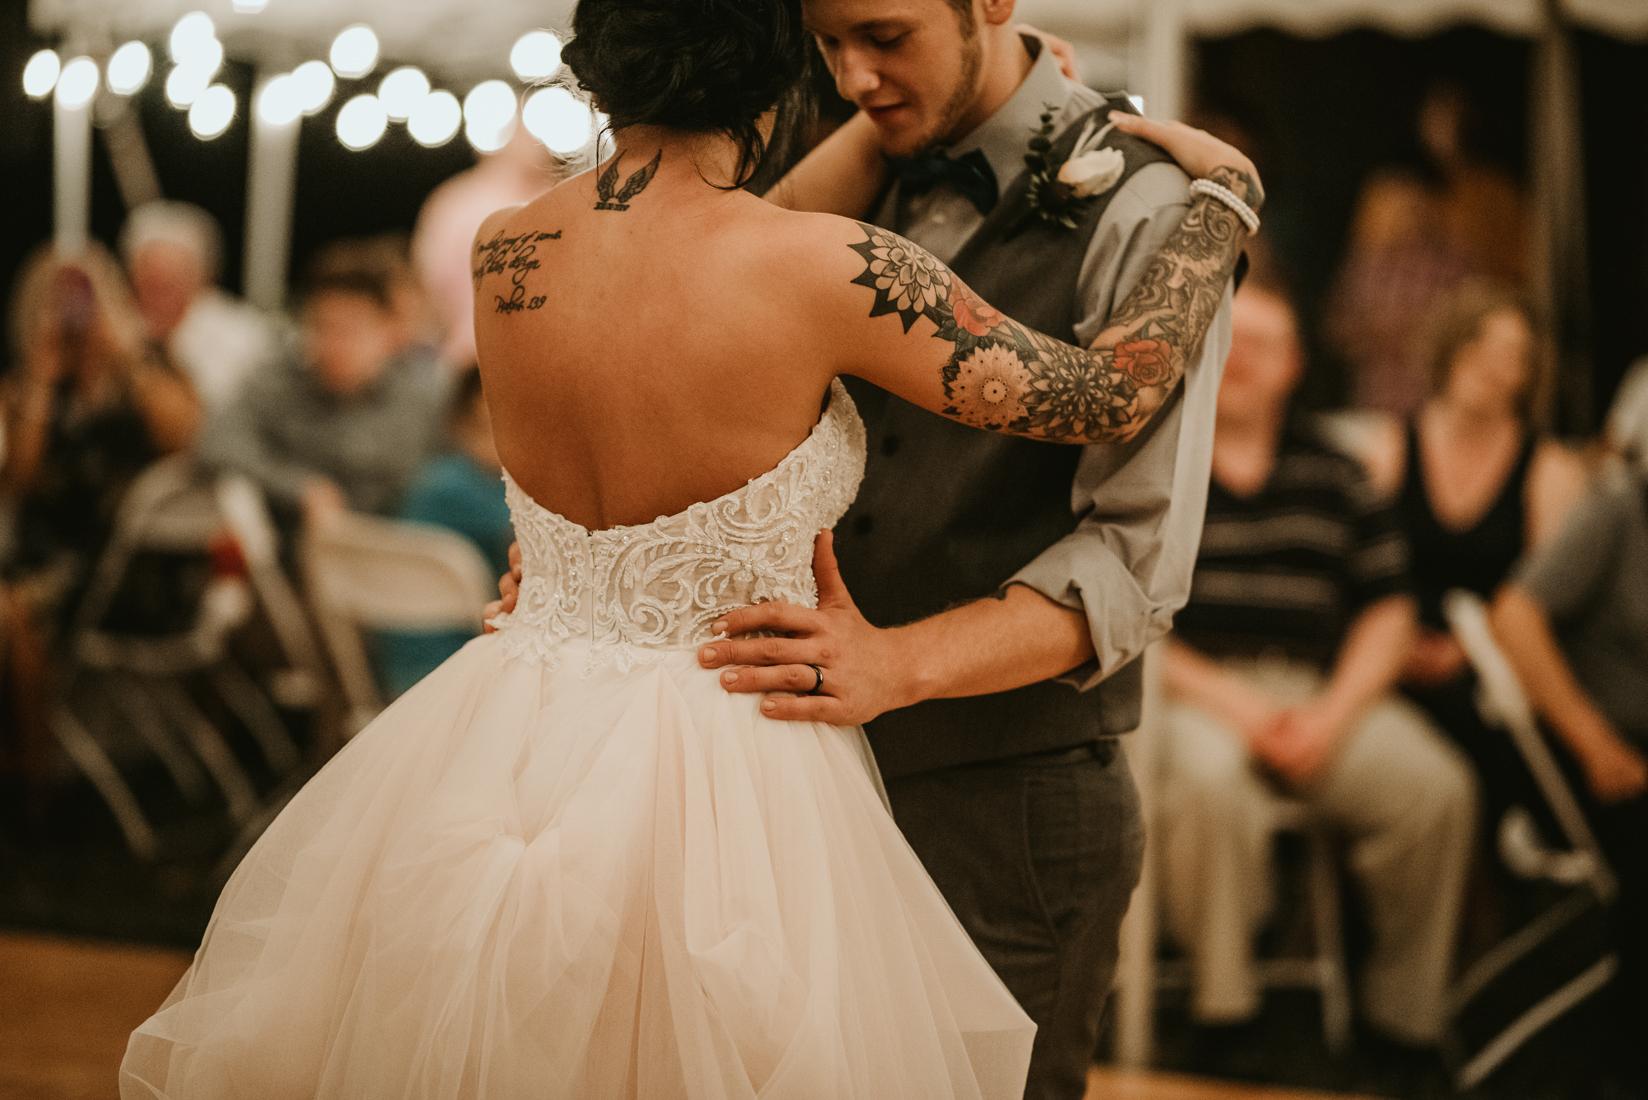 olivia_zay_wedding_09_2018-7850.jpg